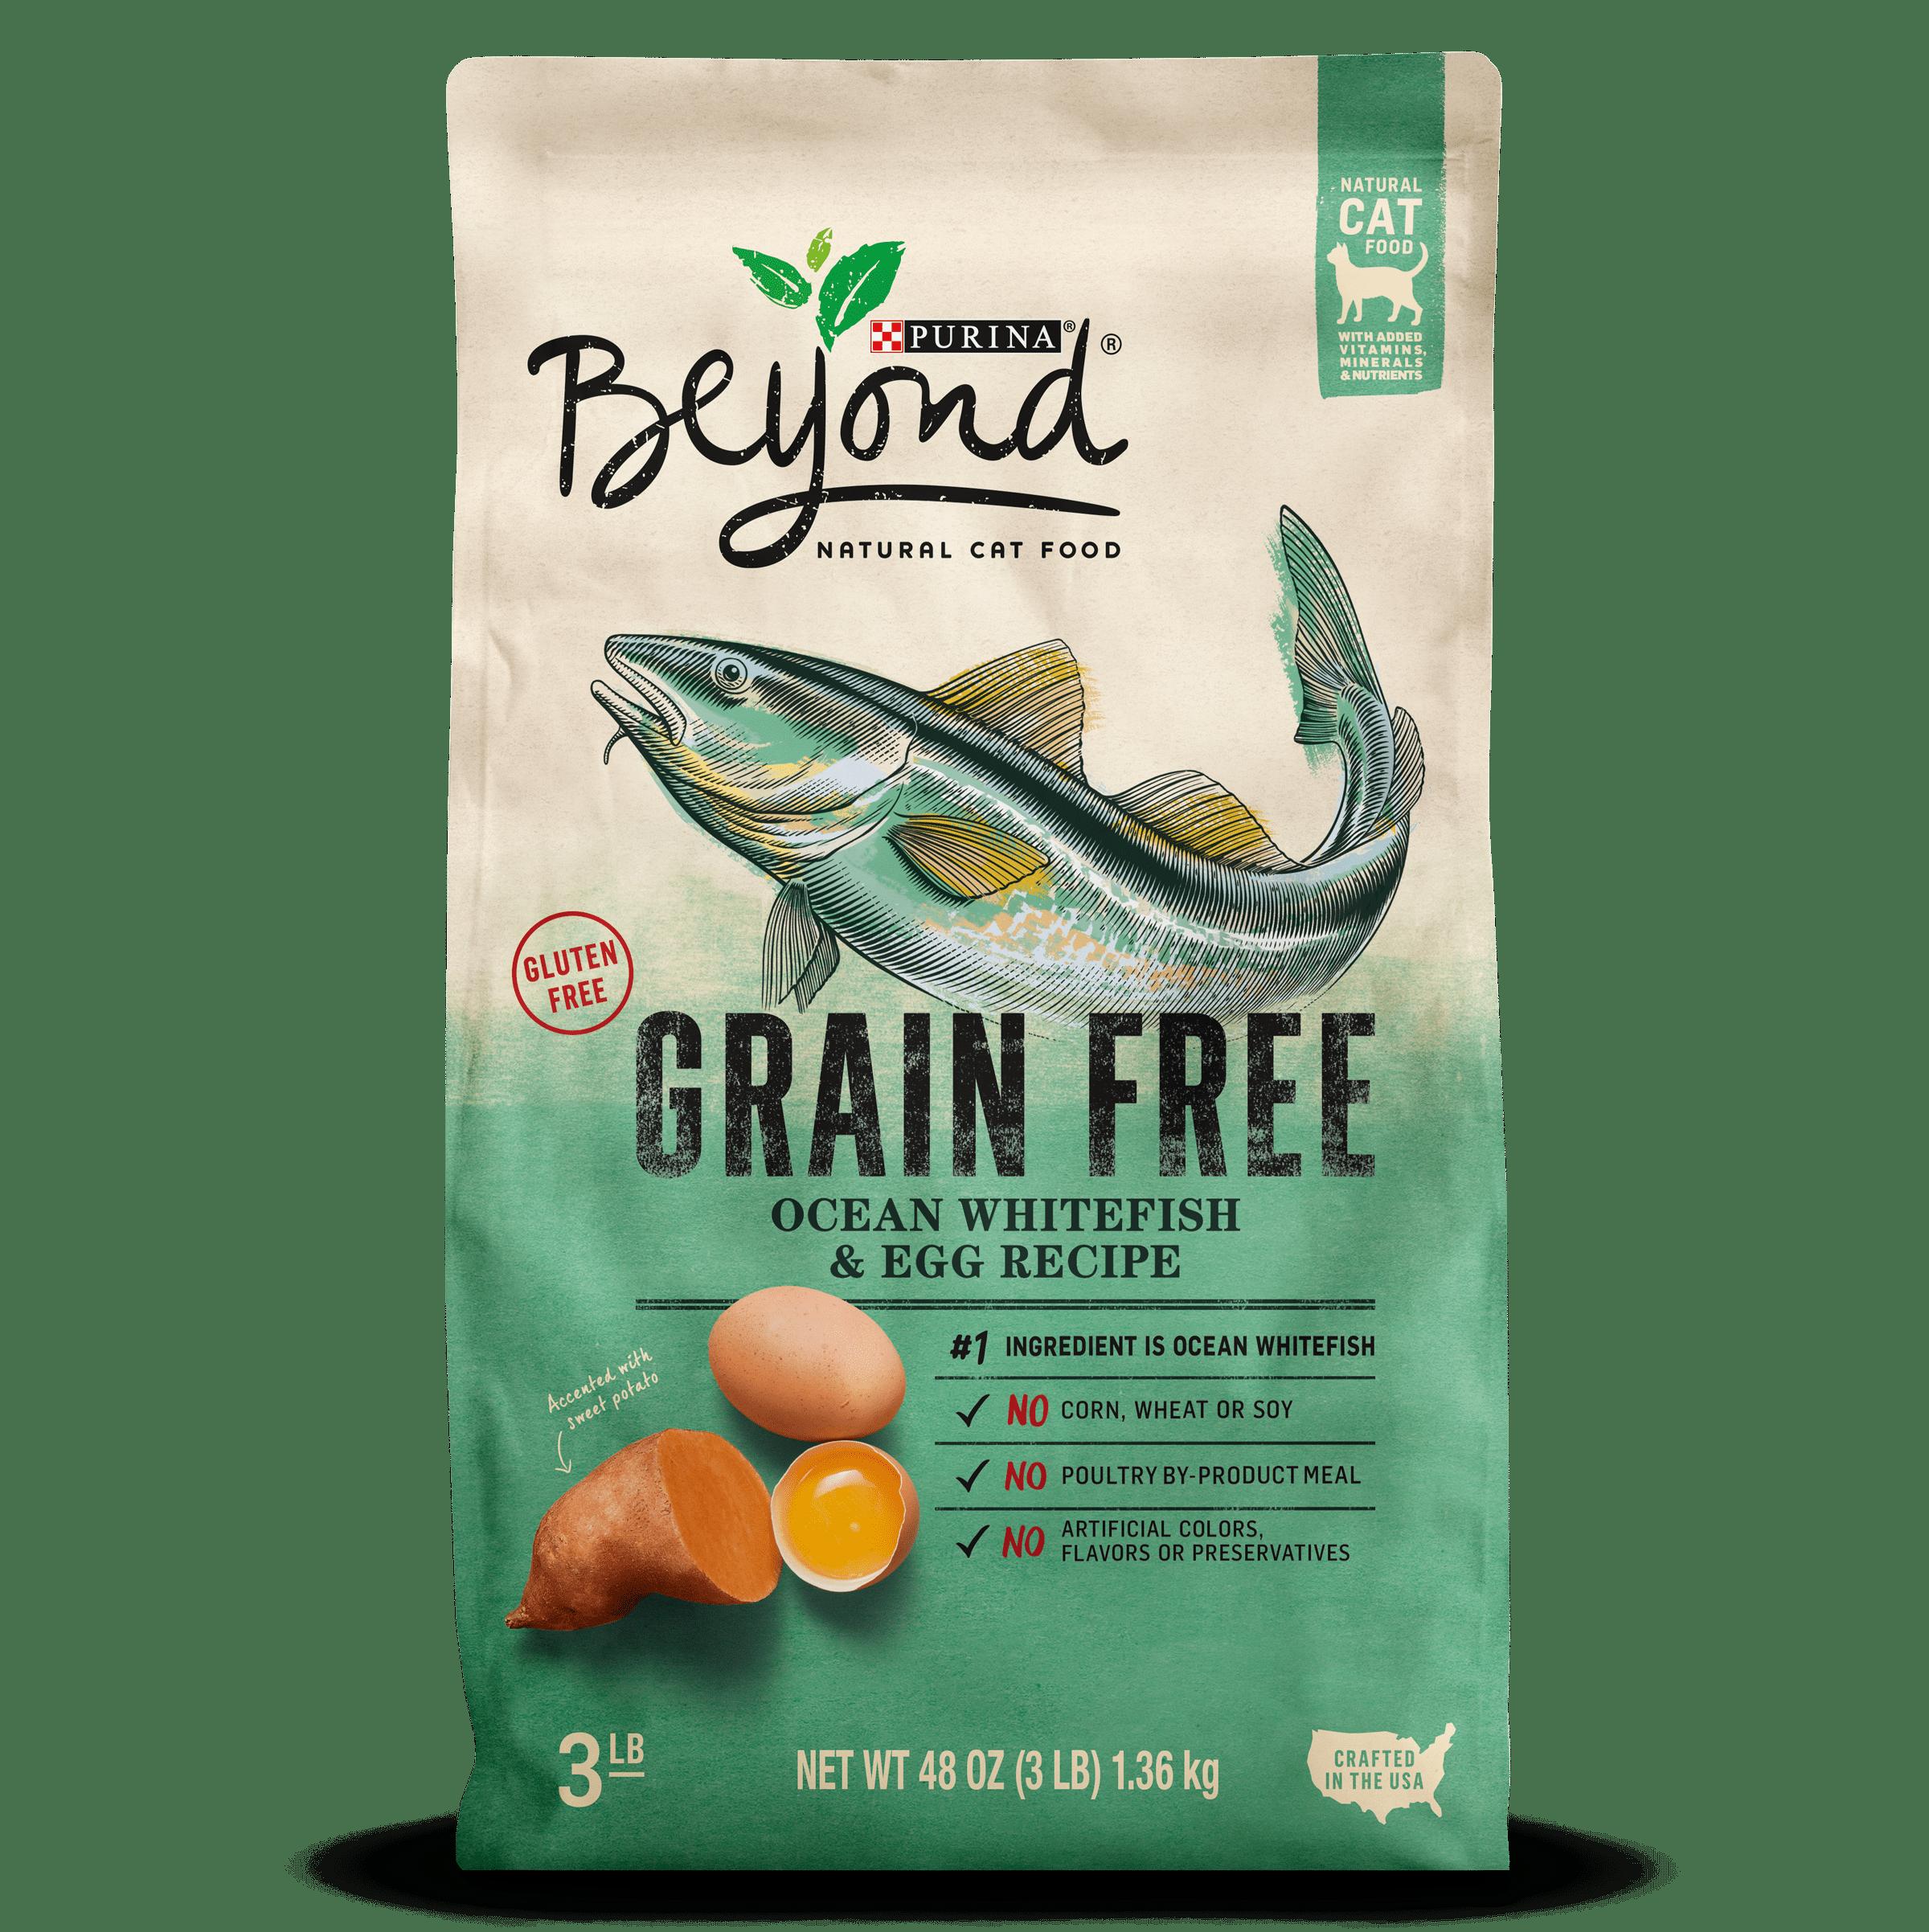 Purina Beyond Grain Free Ocean Whitefish & Egg Recipe Adult Dry Cat Food - 3 lb. Bag